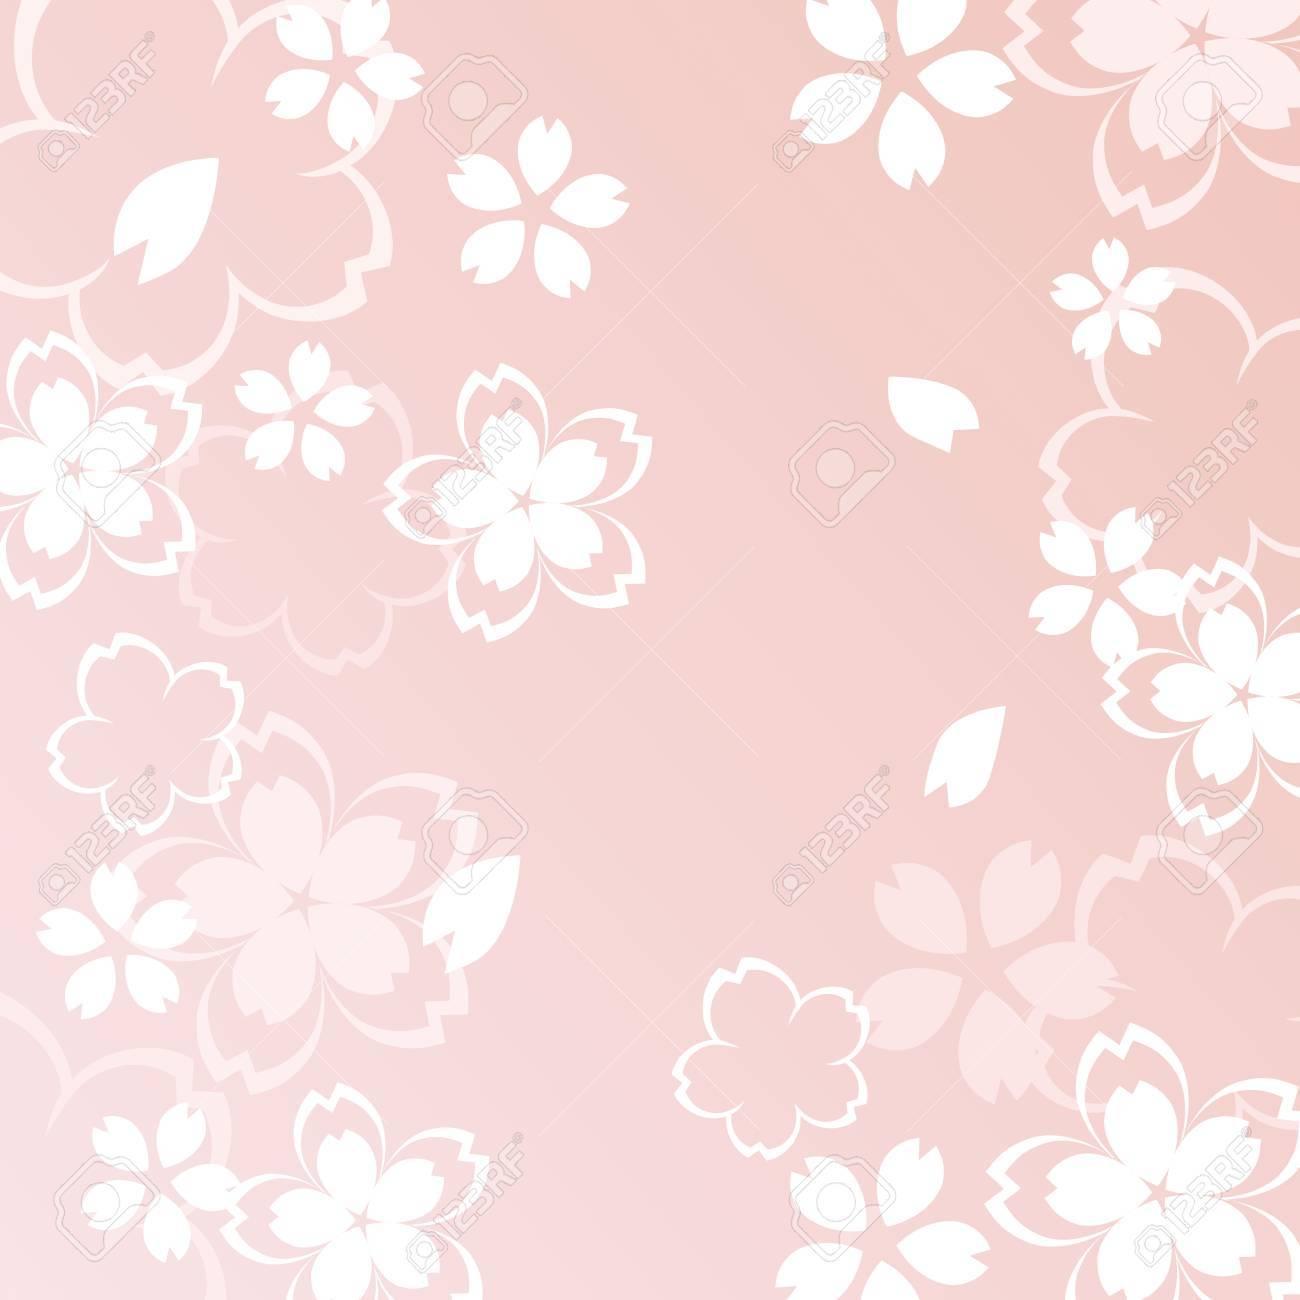 A beautiful cherry blossom illustration - 72211883